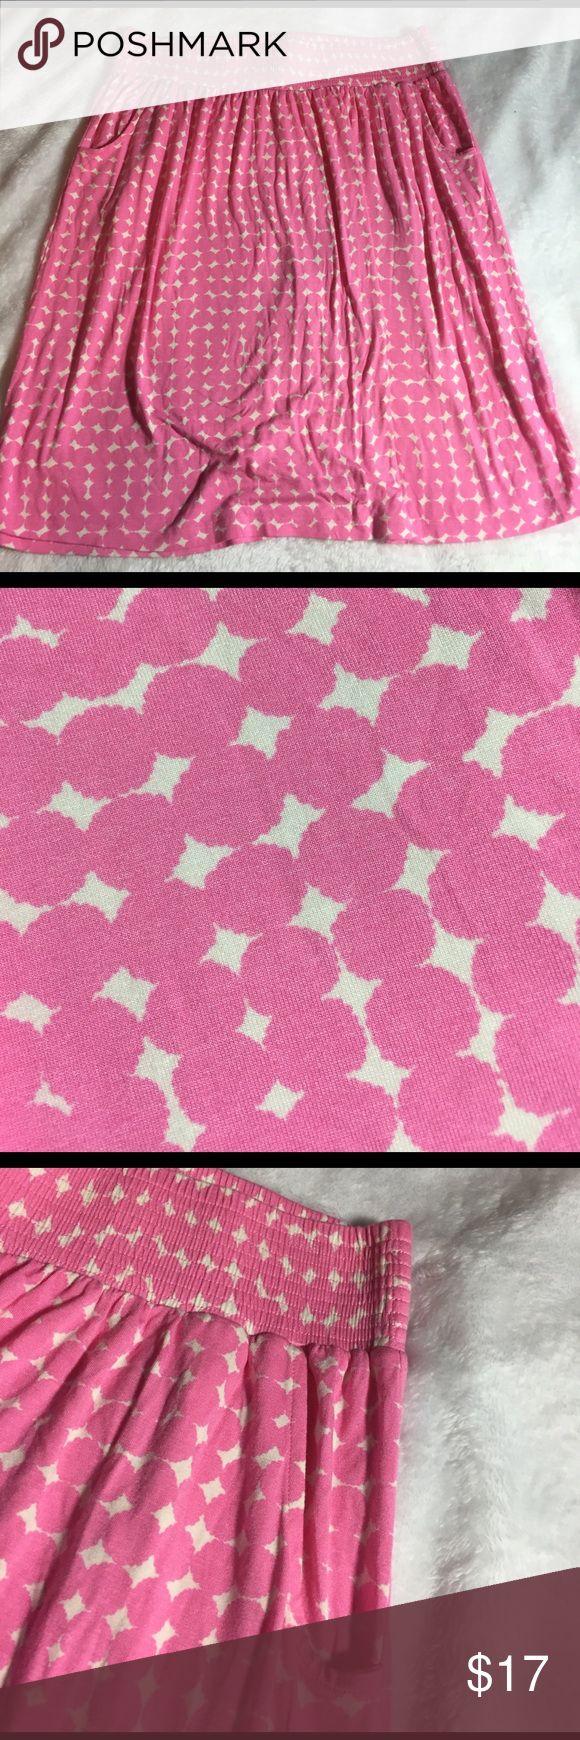 "Boden  women's size 12L pink white stretch skirt EUC Boden size 12L pink and white print elastic waistband.  95% viscose, 5%elastane.  Measurements: 16"" waist laid flat, length: 23"" Boden Skirts"